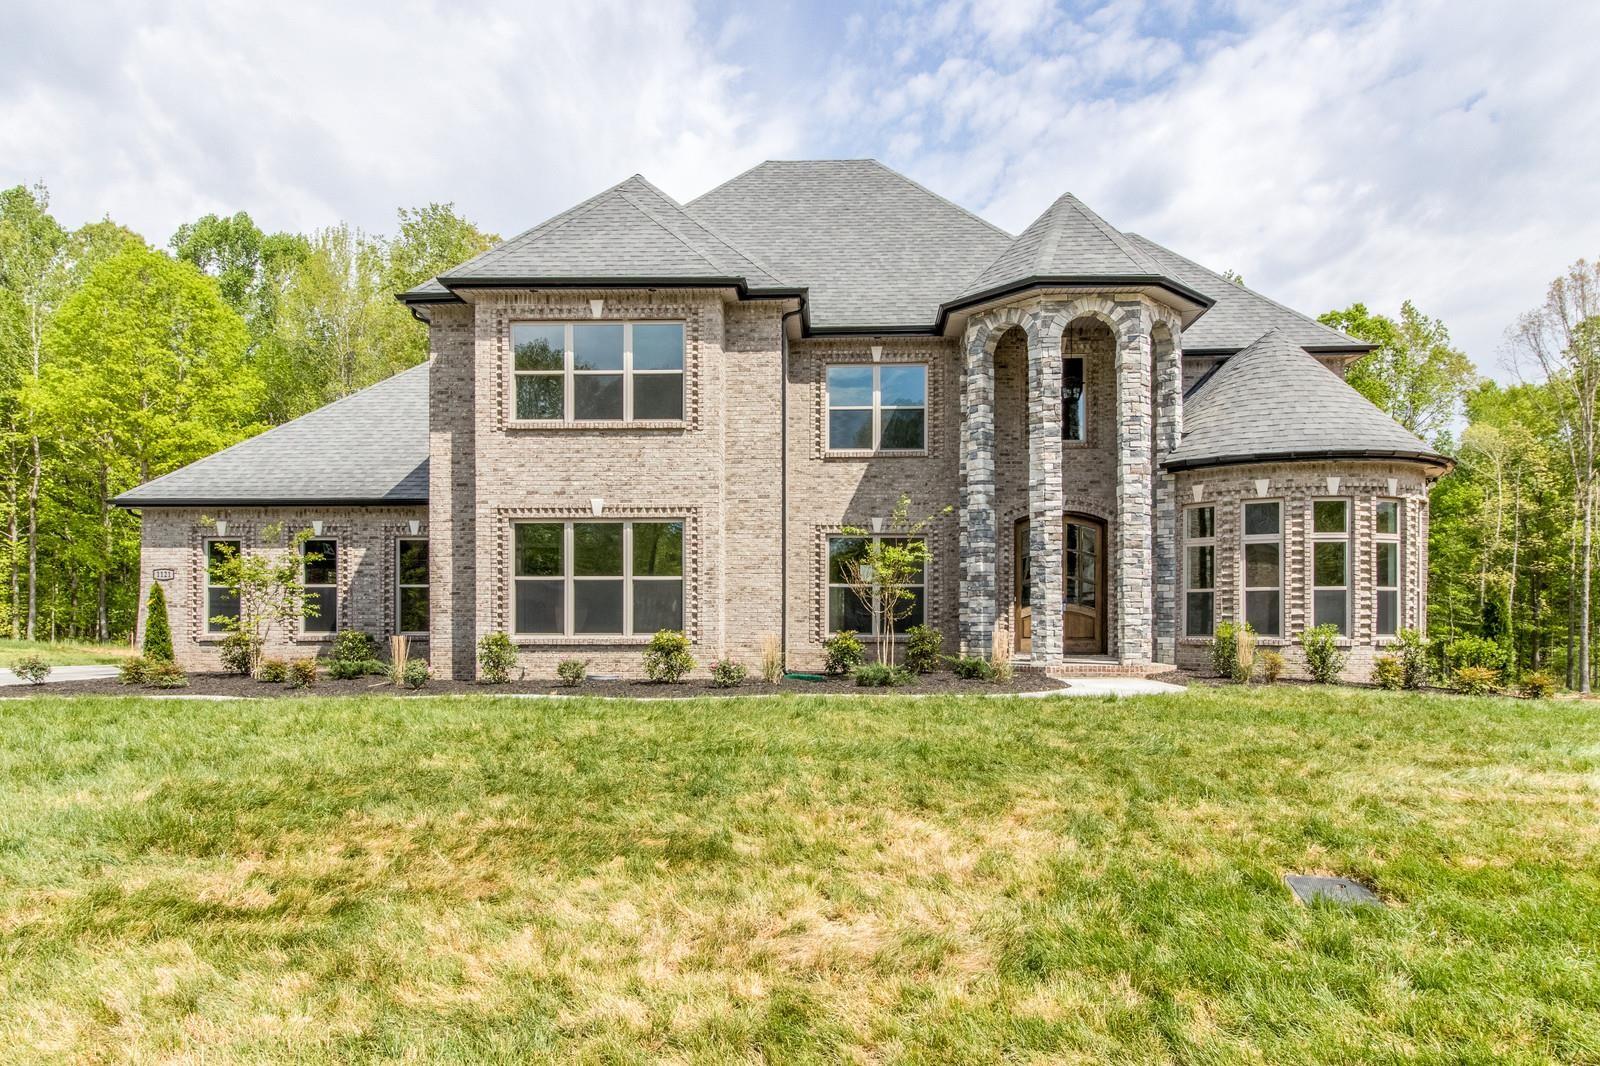 200 Allie Kat Way, Clarksville, TN 37042 - Clarksville, TN real estate listing